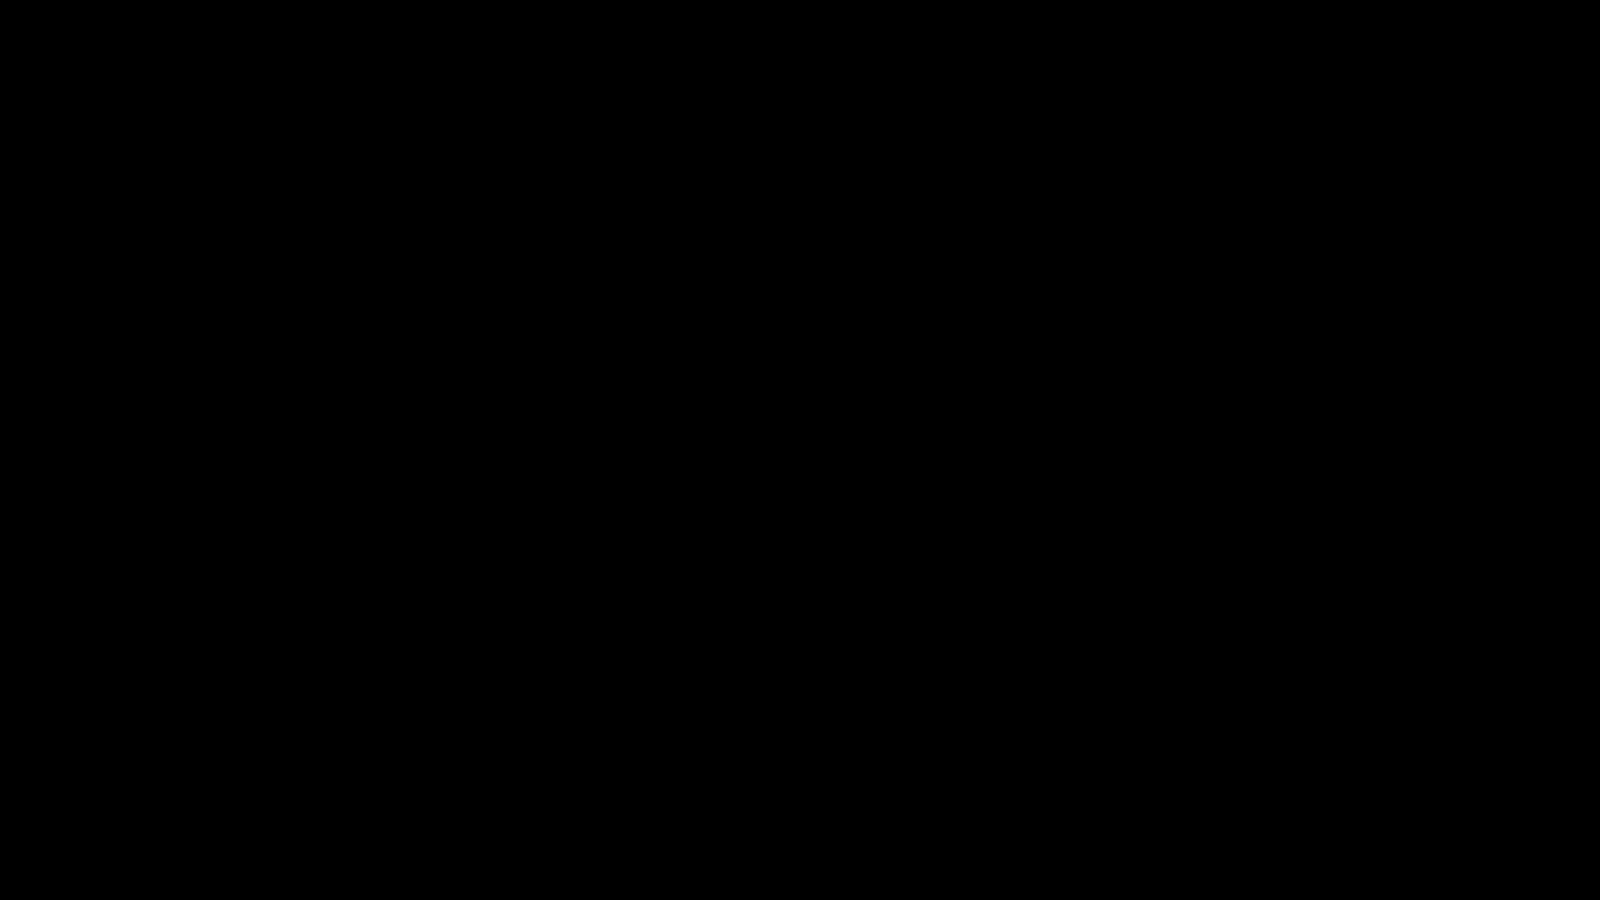 strecke-1